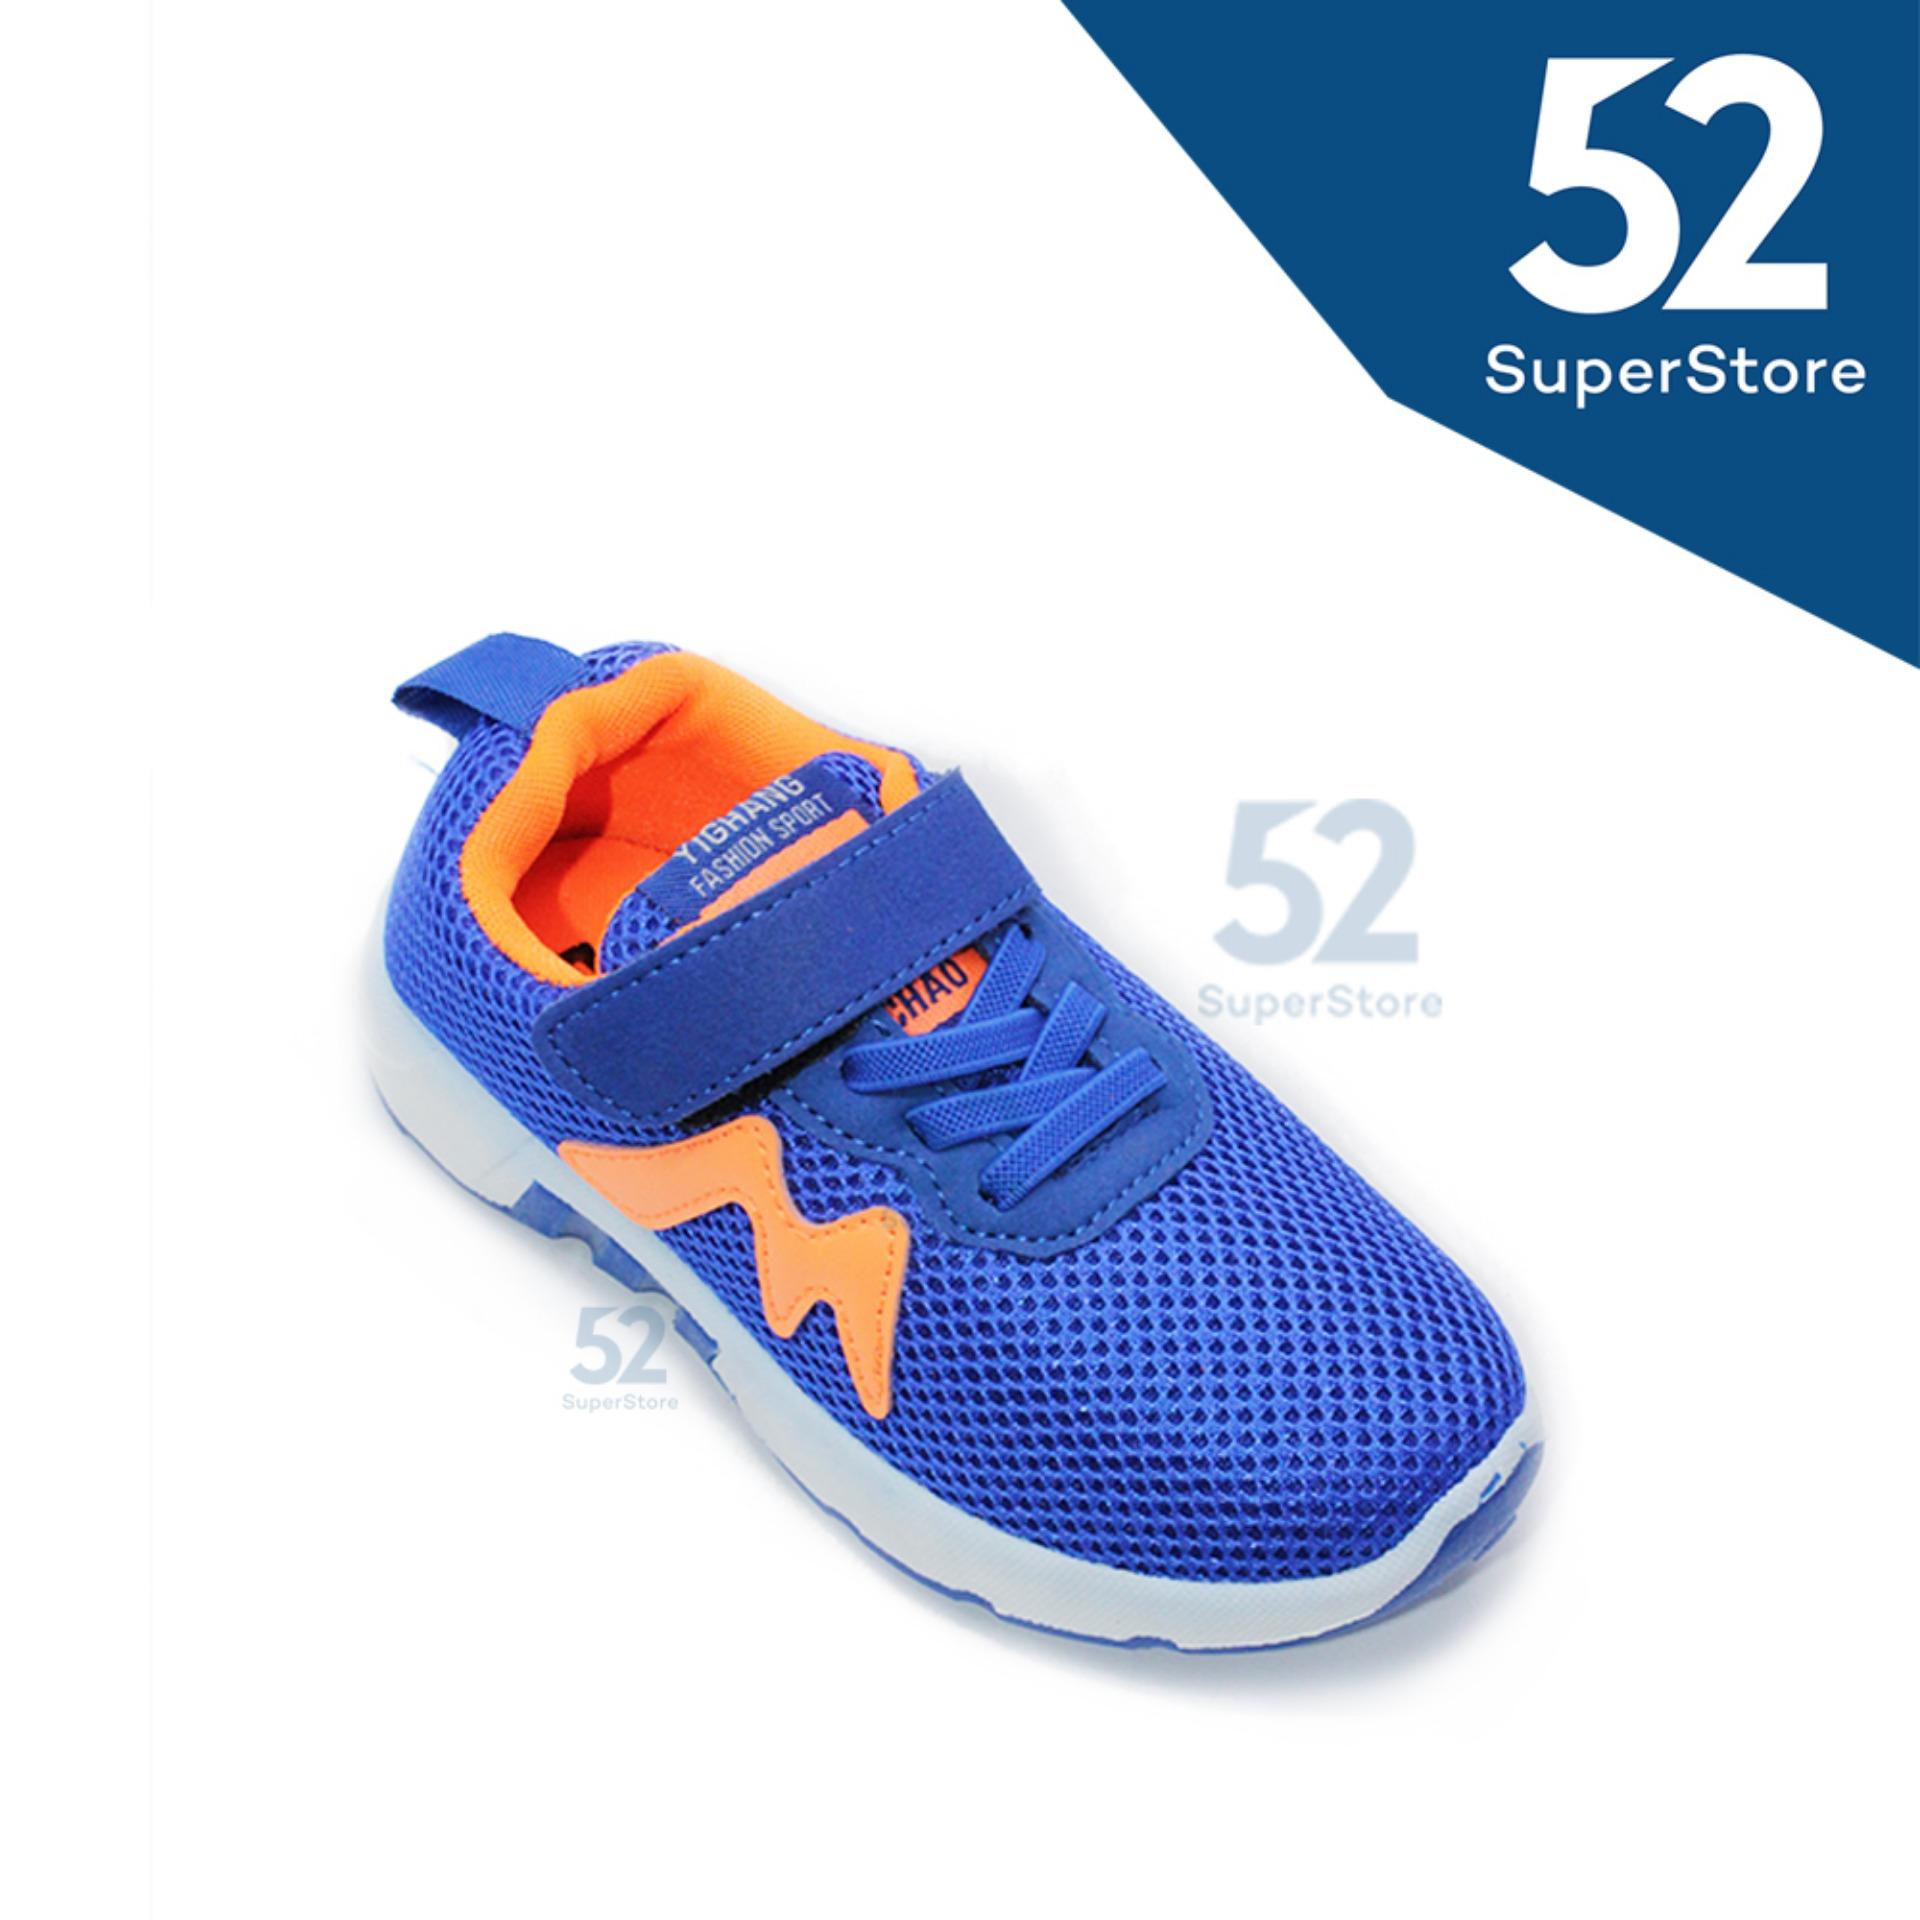 52 Fashion Sepatu Sport Anak 1611-112 - Navy - Size 31-36